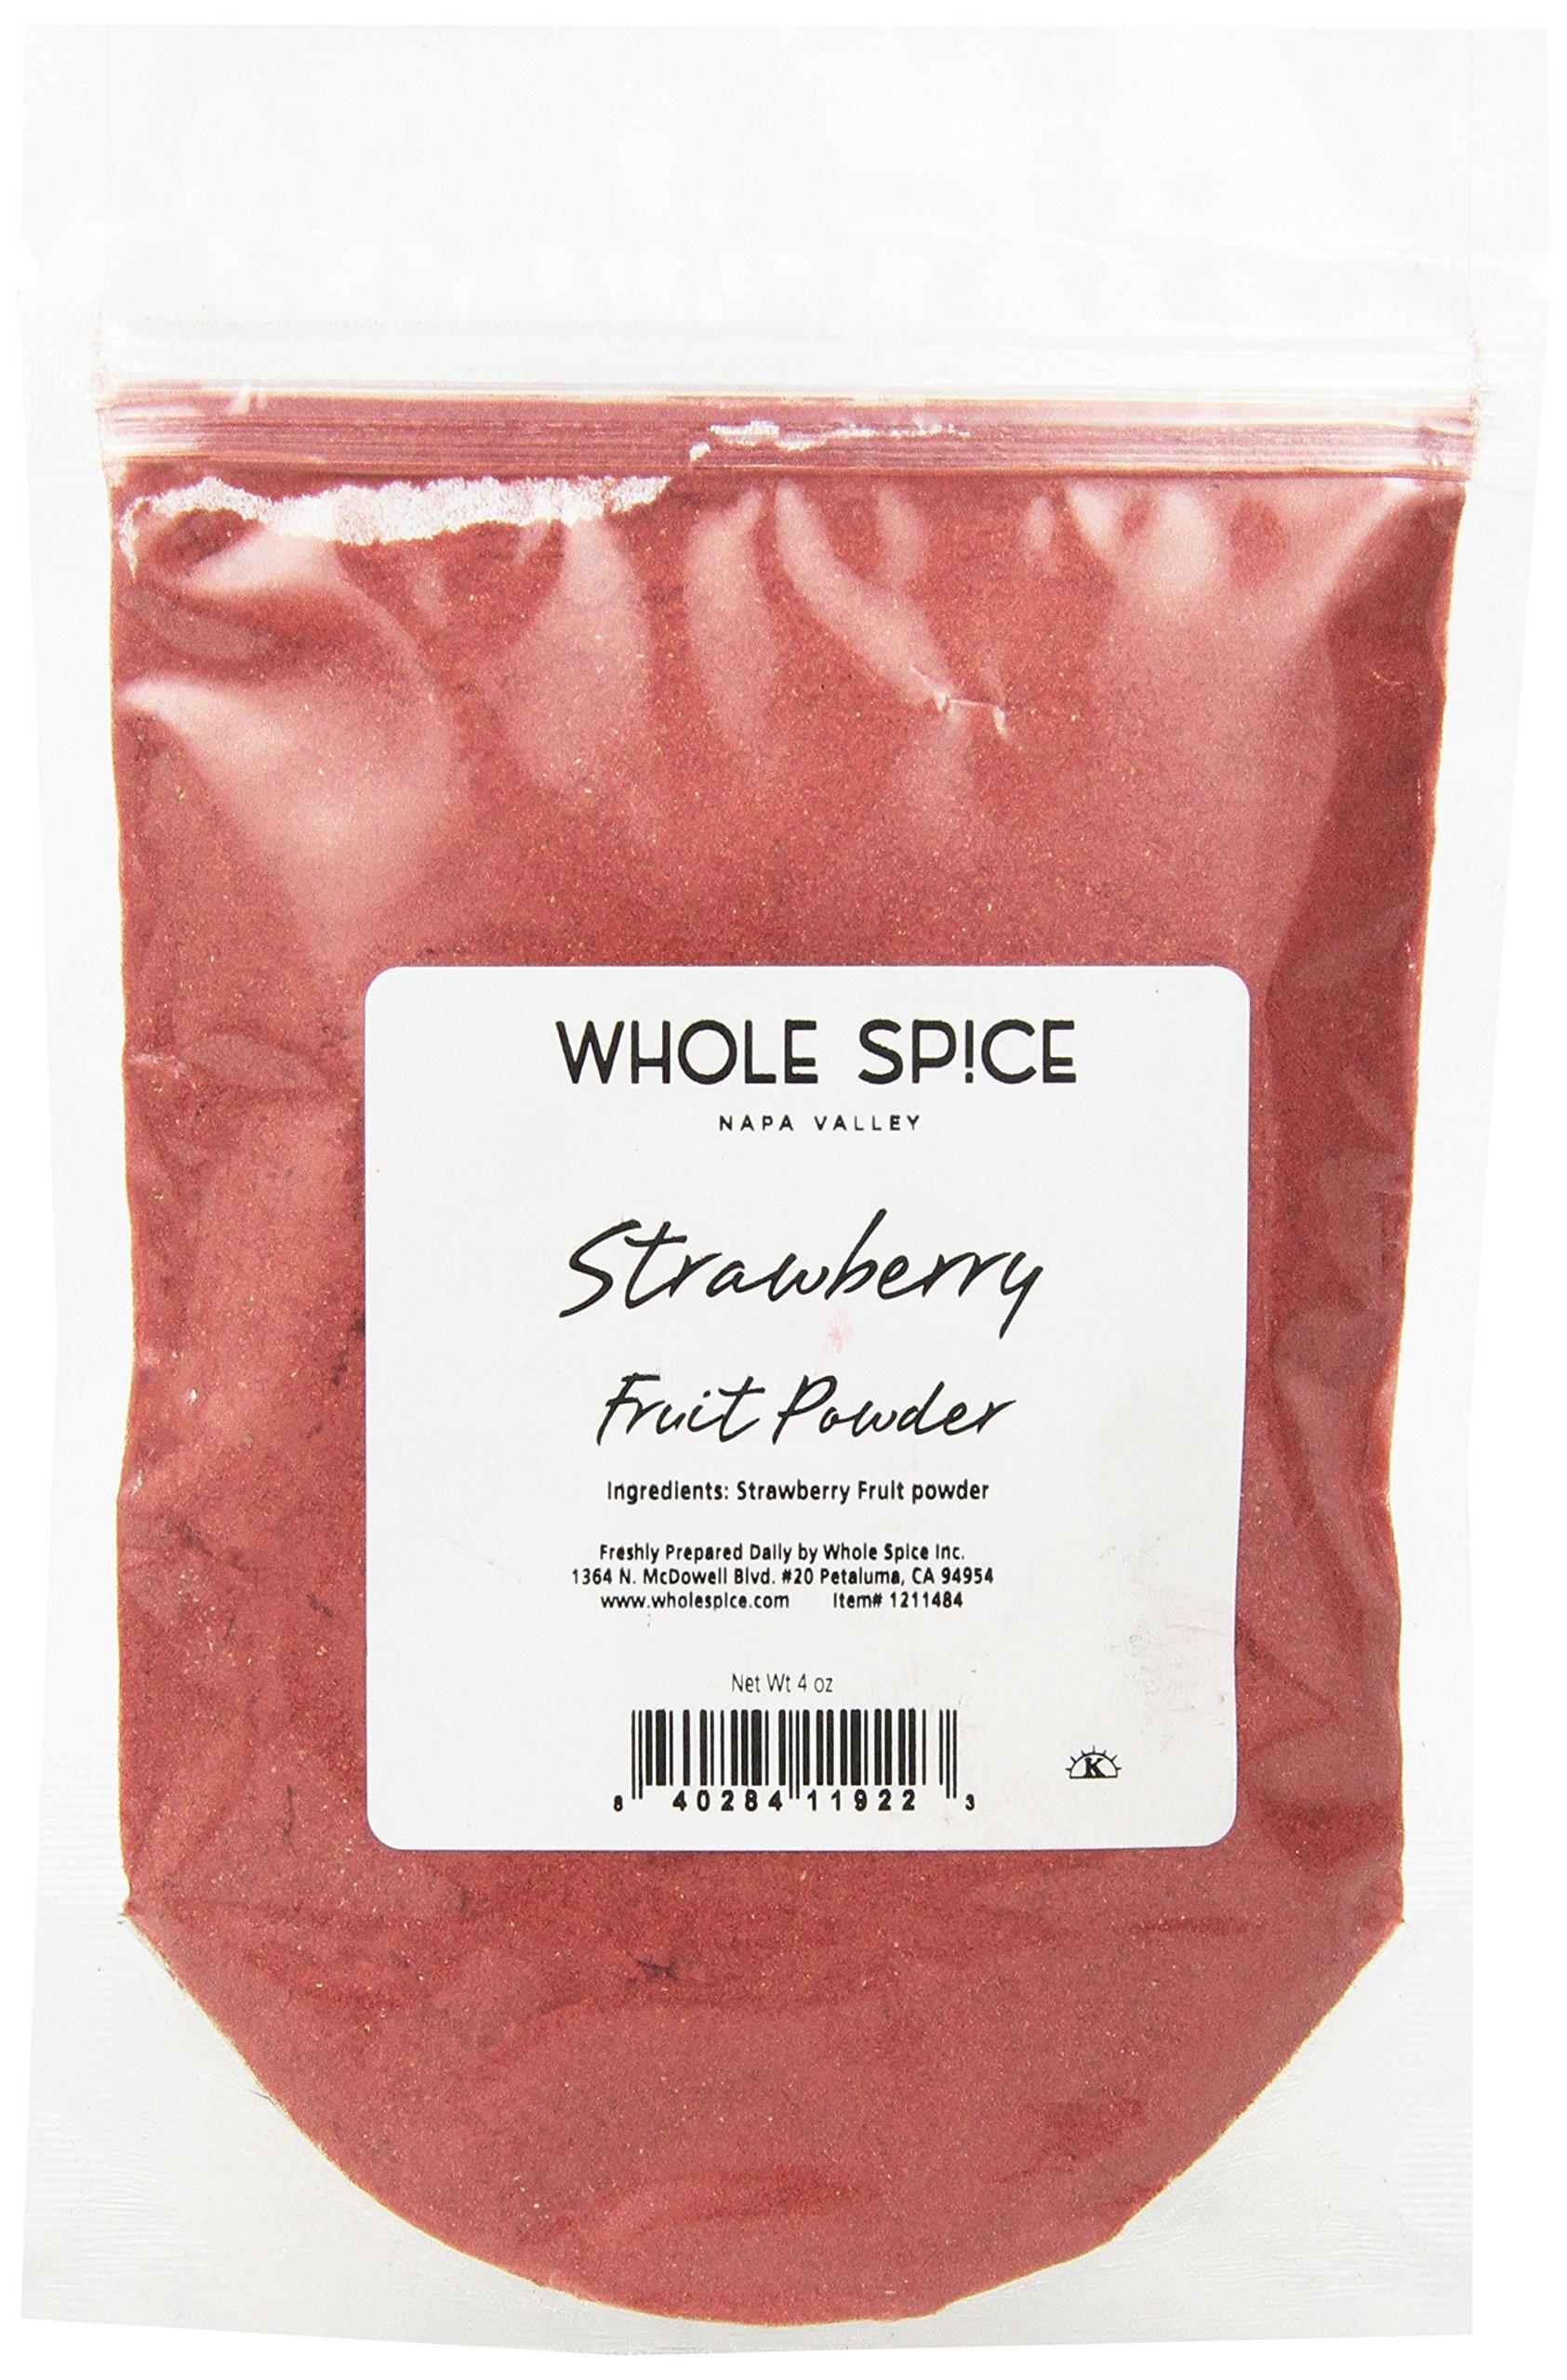 Whole Spice Strawberry Fruit Powder, 4 Ounce